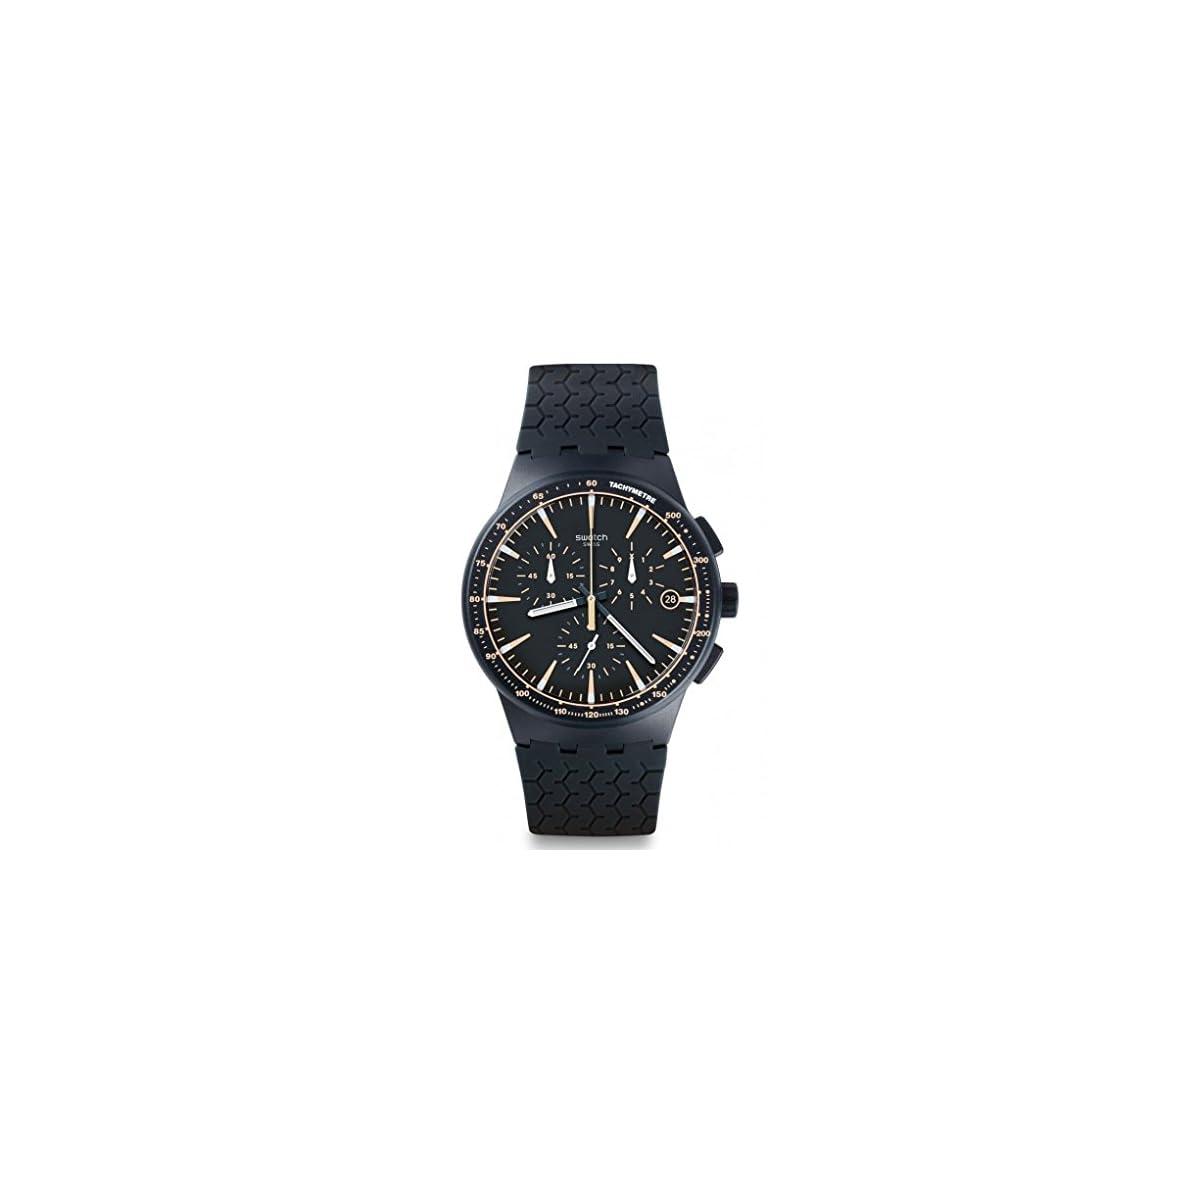 51uqEb toGL. SS1200  - SWATCH Reloj de Cuarzo Unisex Meine Spur